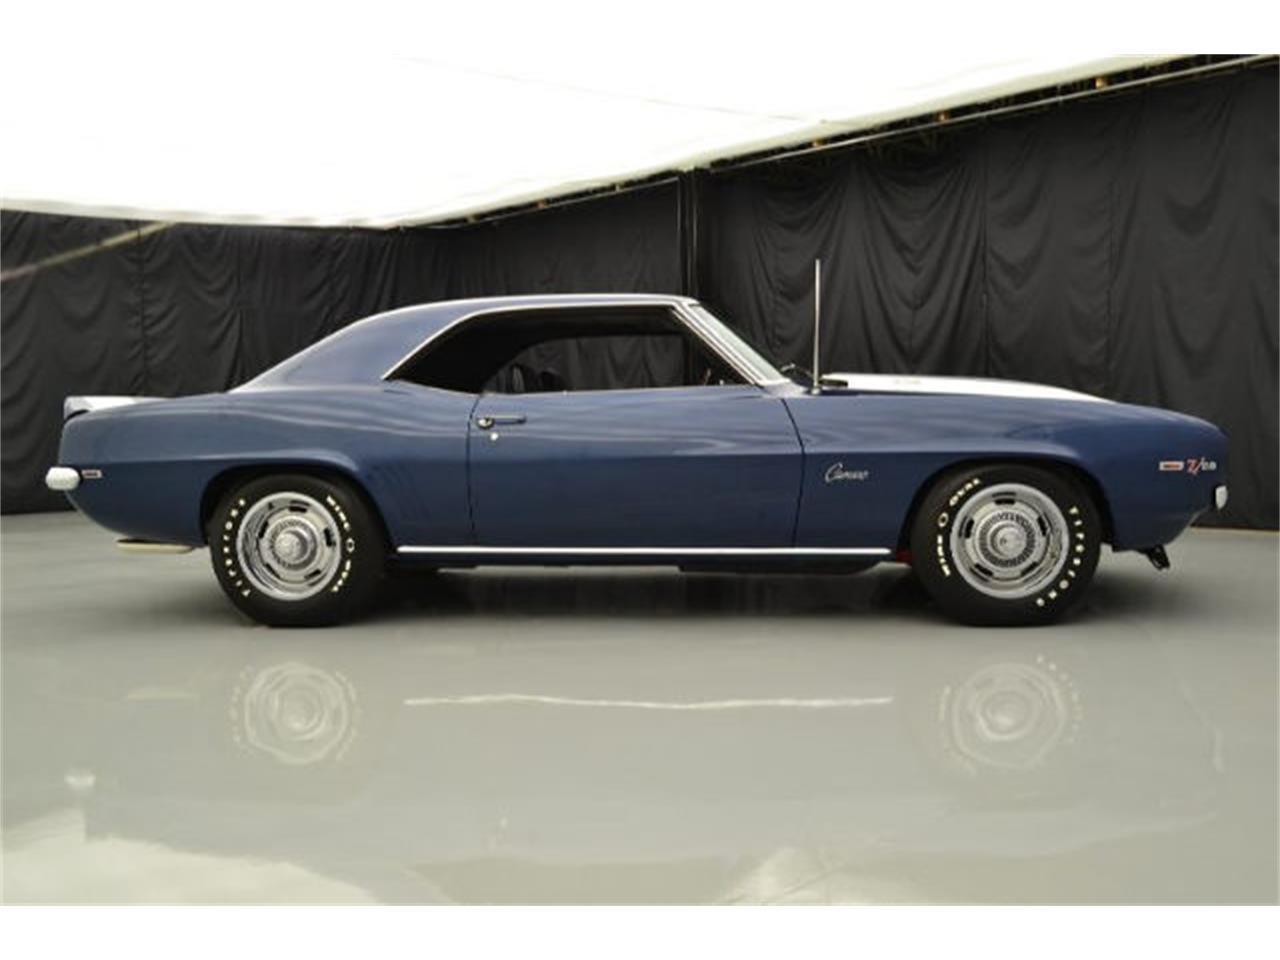 Large Picture of '69 Camaro located in North Carolina - JRD8